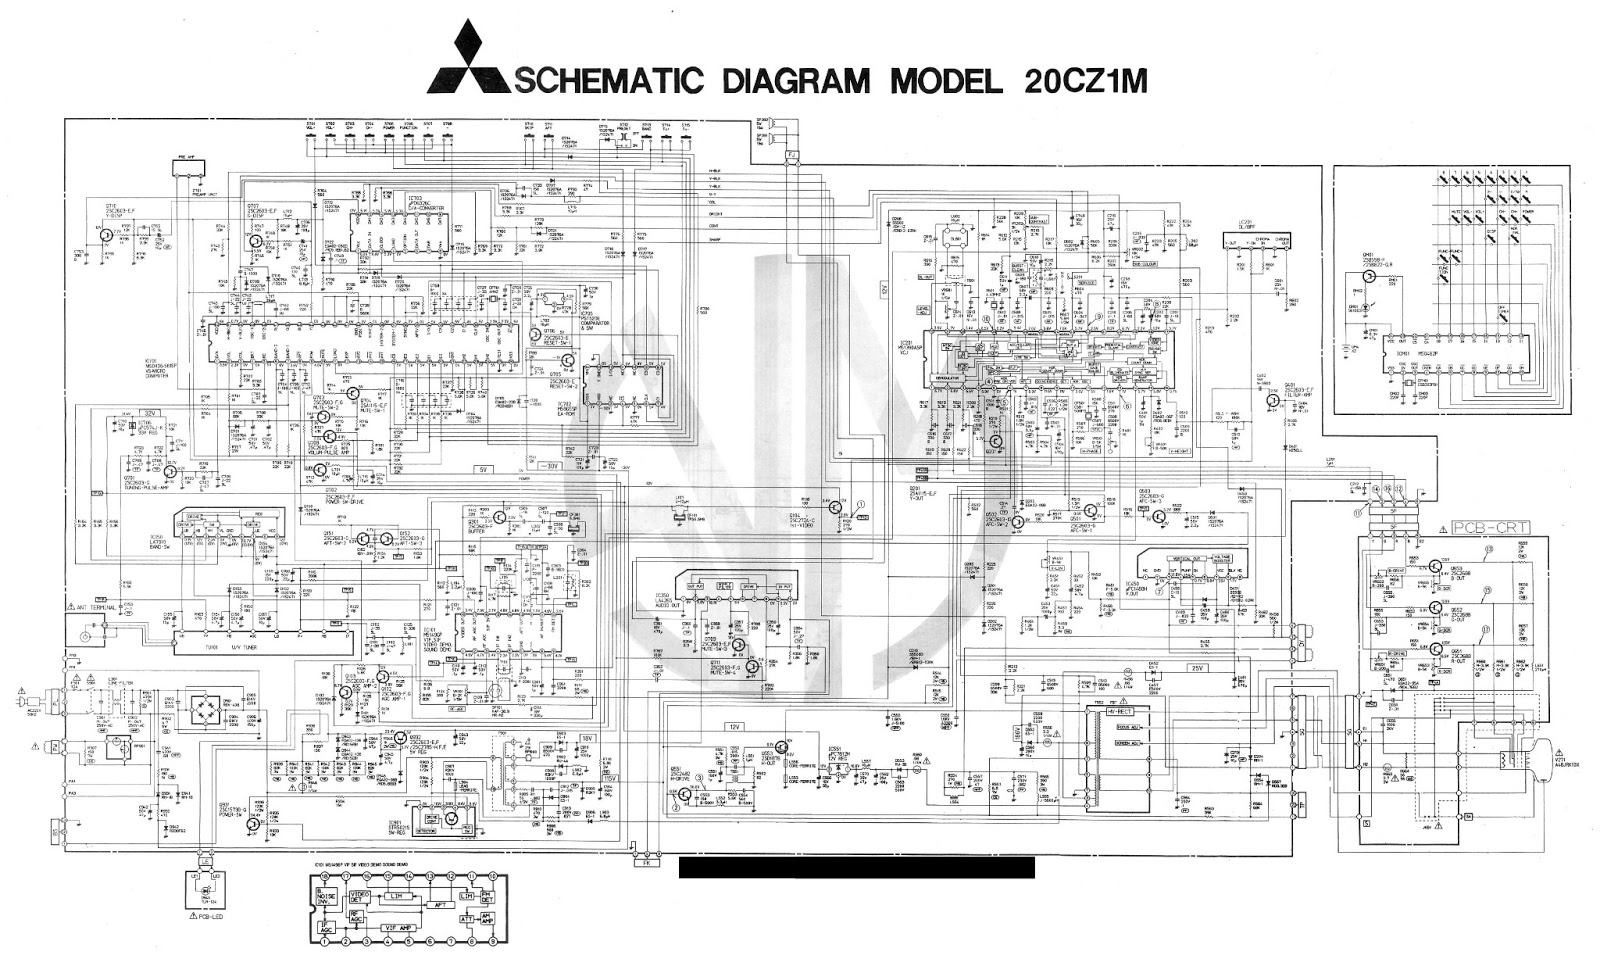 schematic diagram mitsubishi tv 15 13 combatarms game de u2022mitsubishi tv diagram 10 artatec automobile [ 1600 x 966 Pixel ]